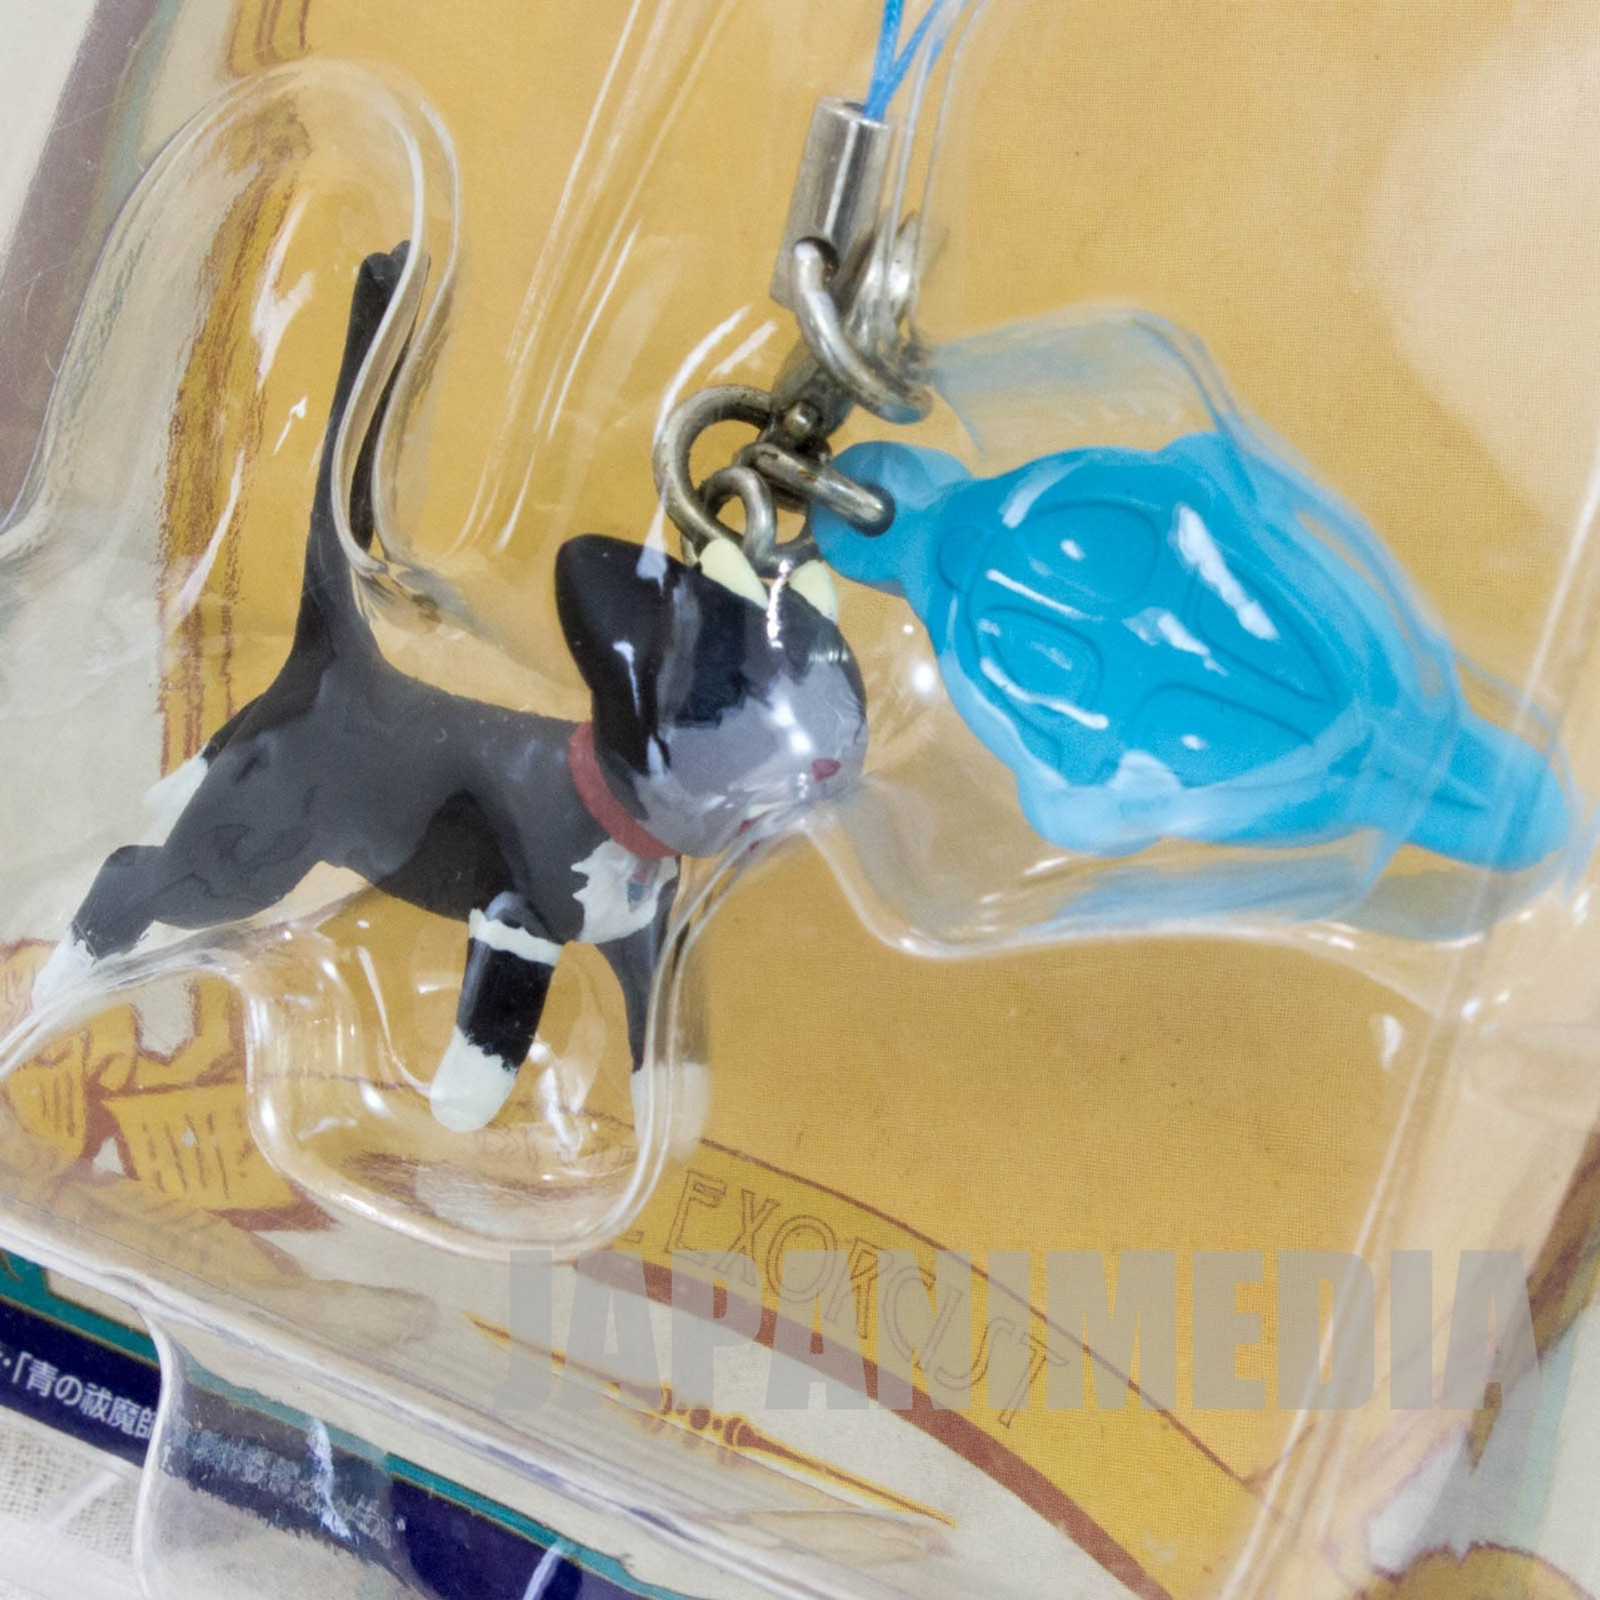 Blue Exorcist Kuro Mascot Figure Strap Banpresto JAPAN ANIME MANGA